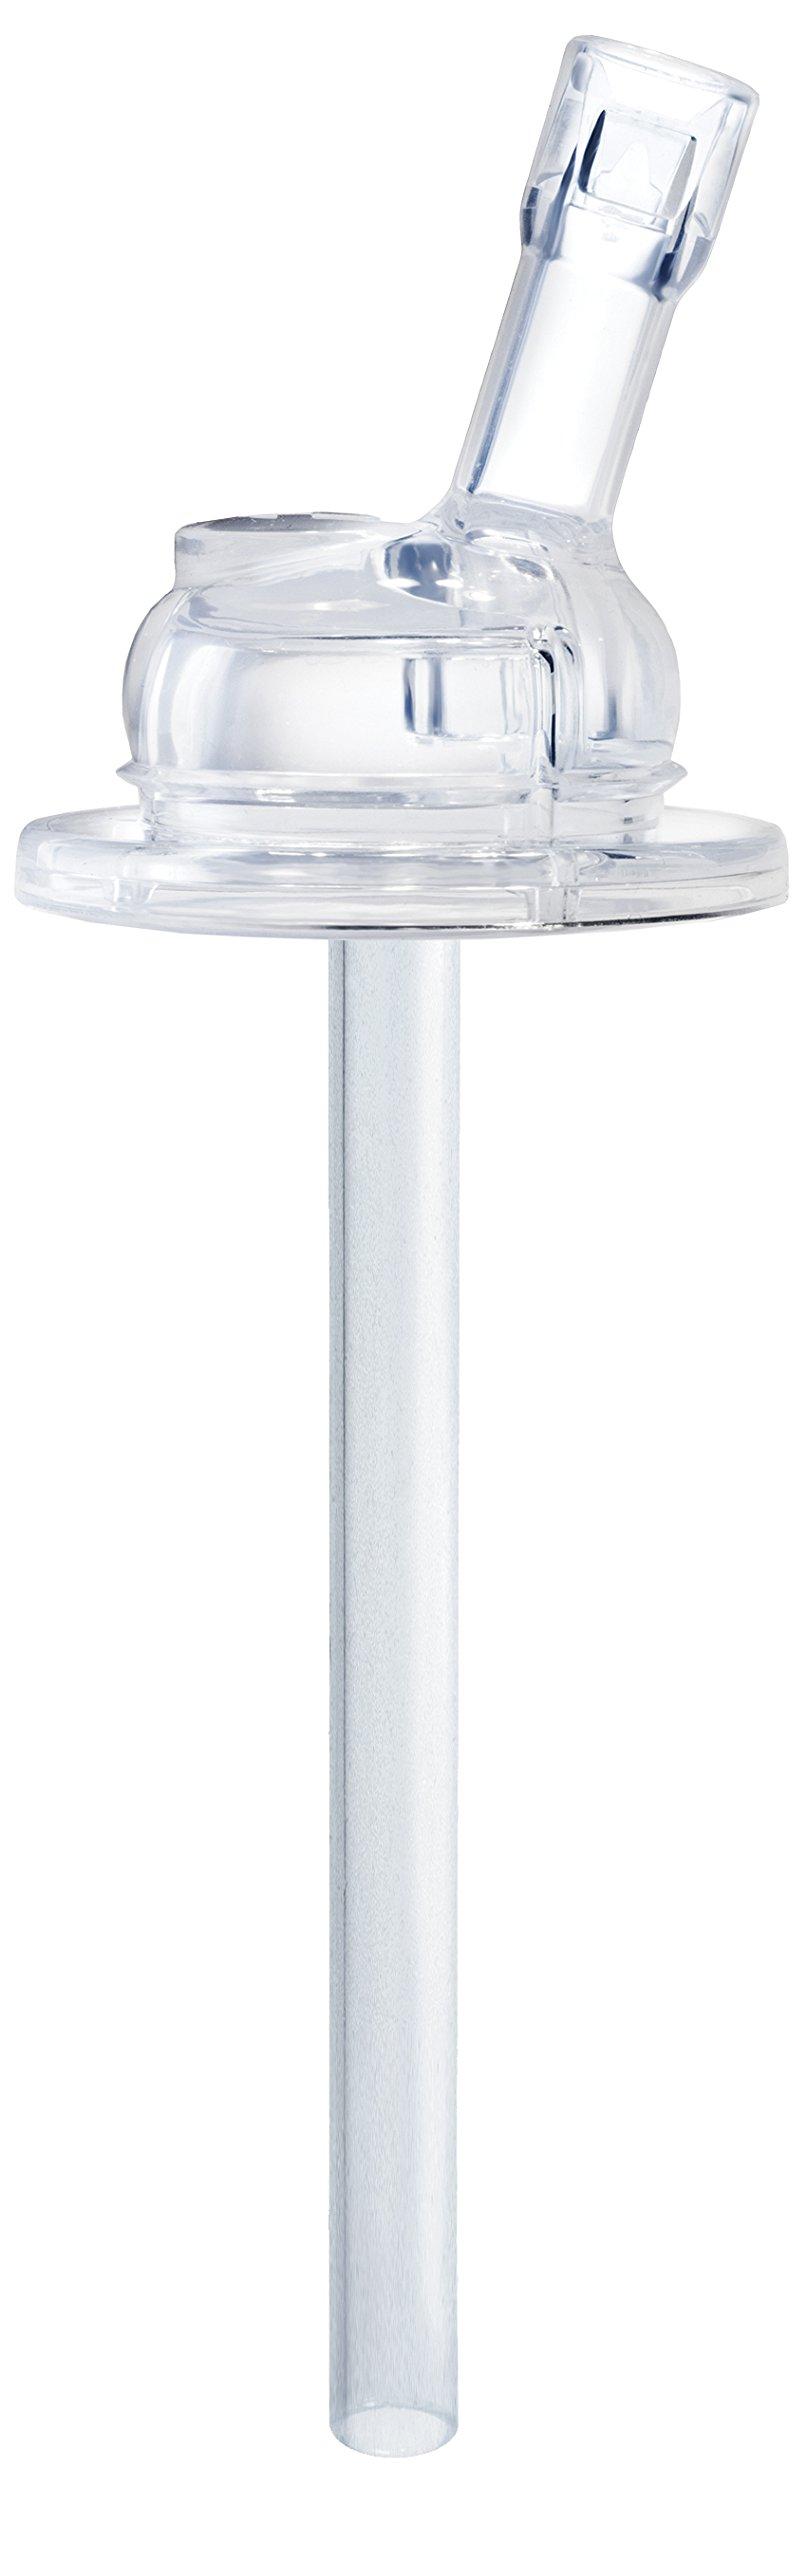 Pura XL Sipper Spout Insulated Sippy Cup - Aqua - 9 oz Plus Silicone Straw